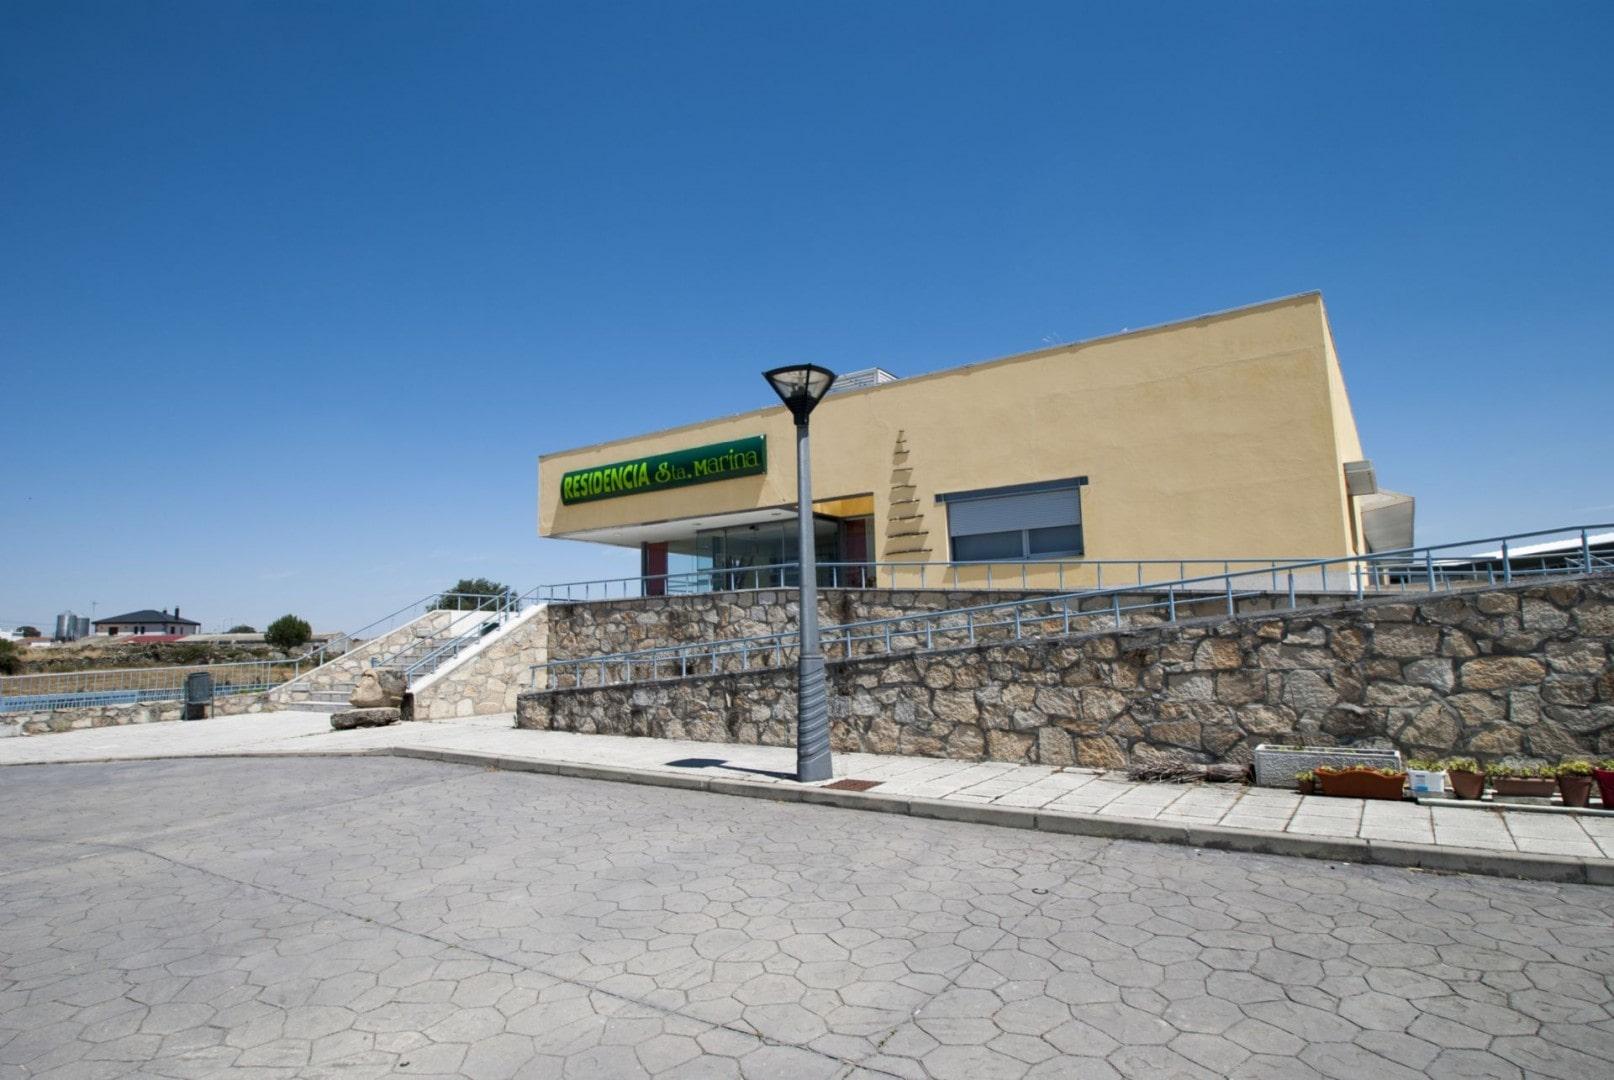 Residencia_Santa_Marina_Exterior_3